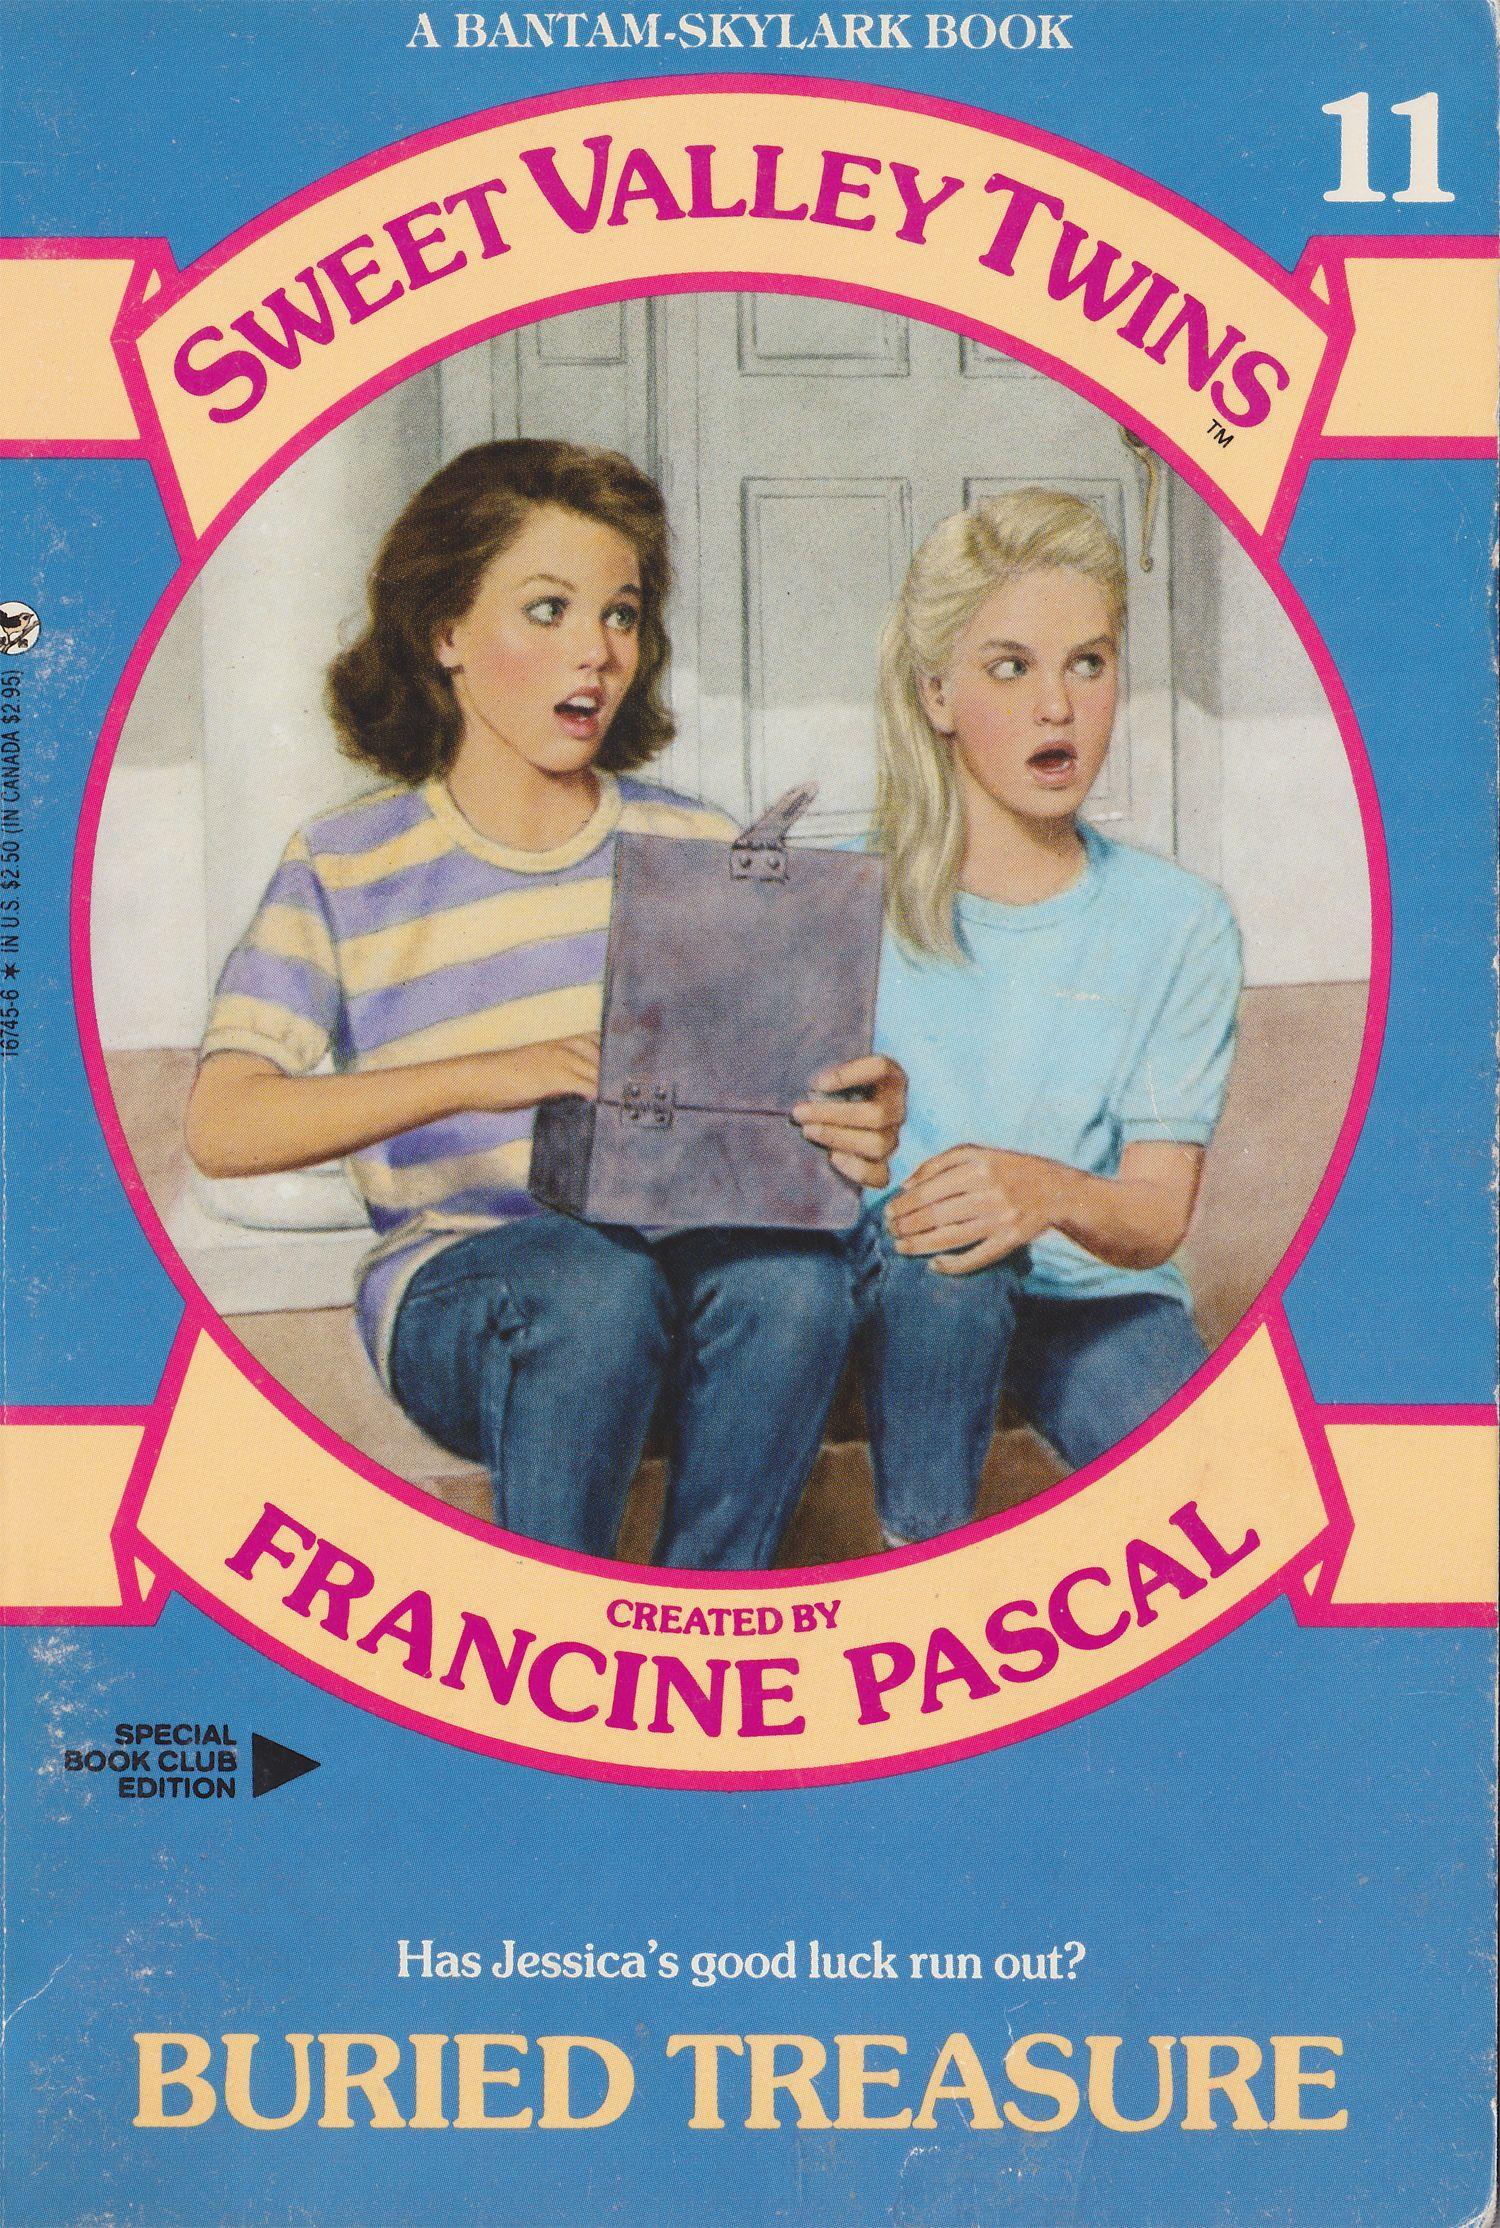 Vol 11 Sweet Valley Twins Buried Treasure By Francine